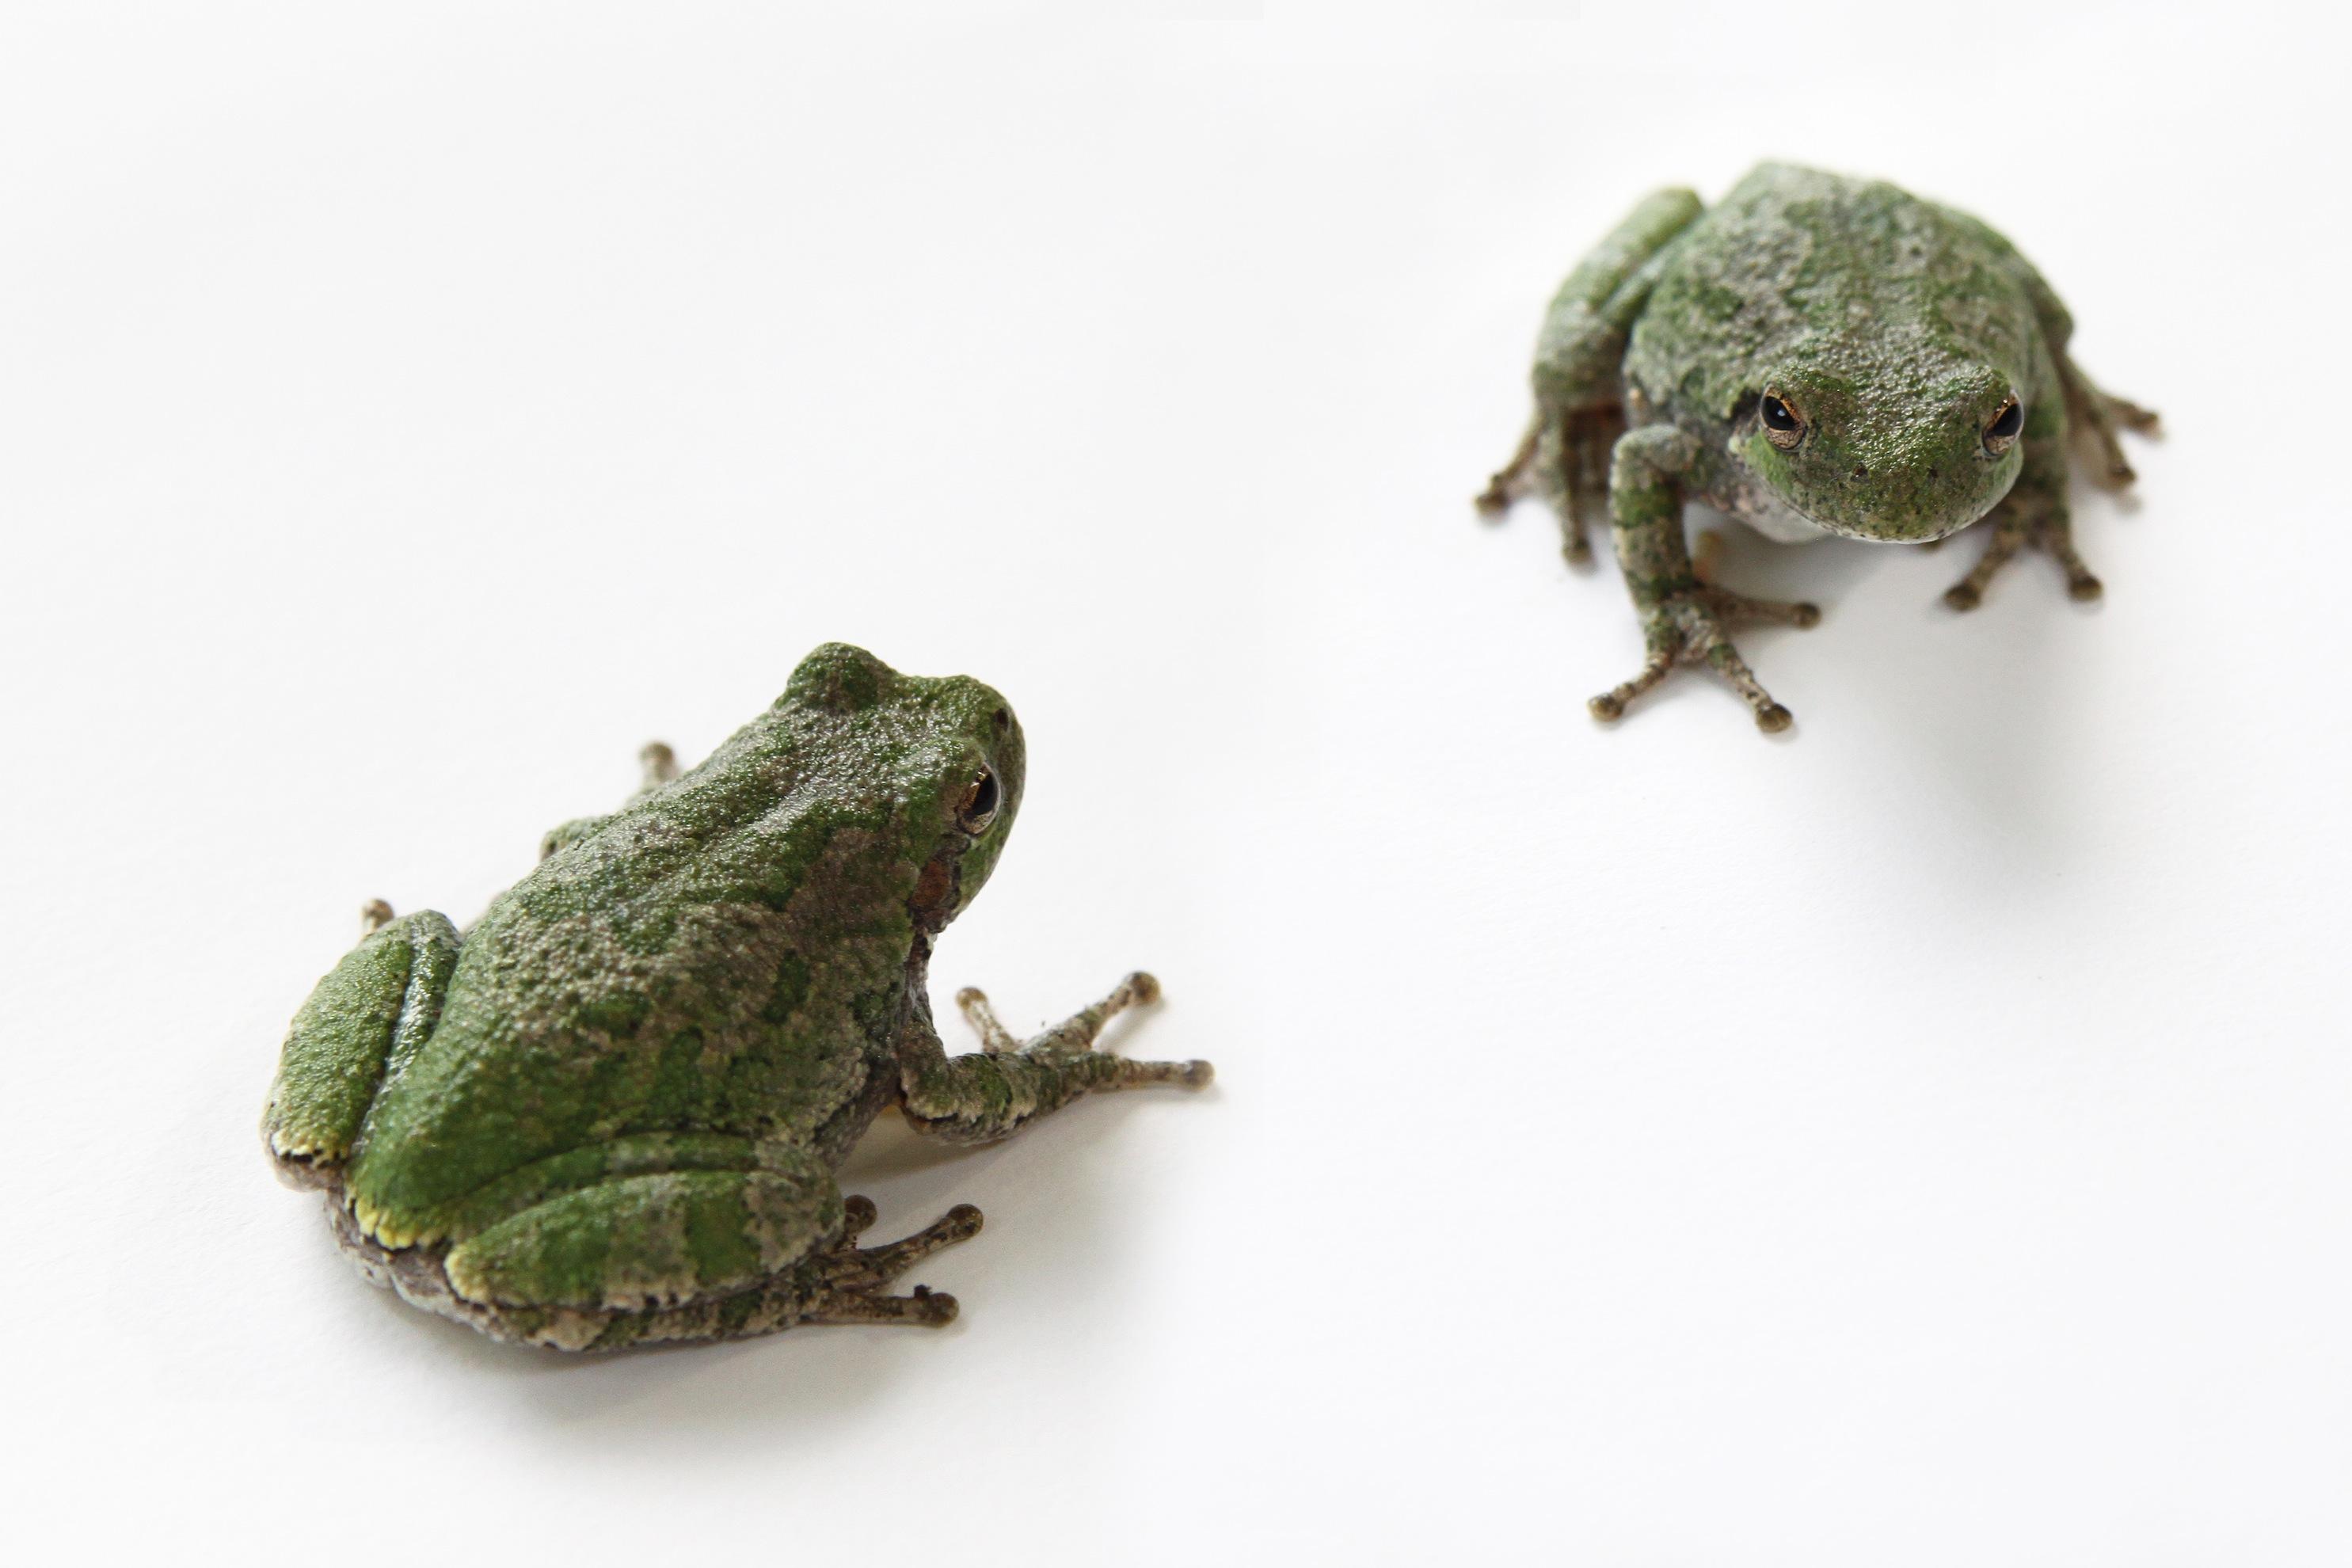 gray tree frogs